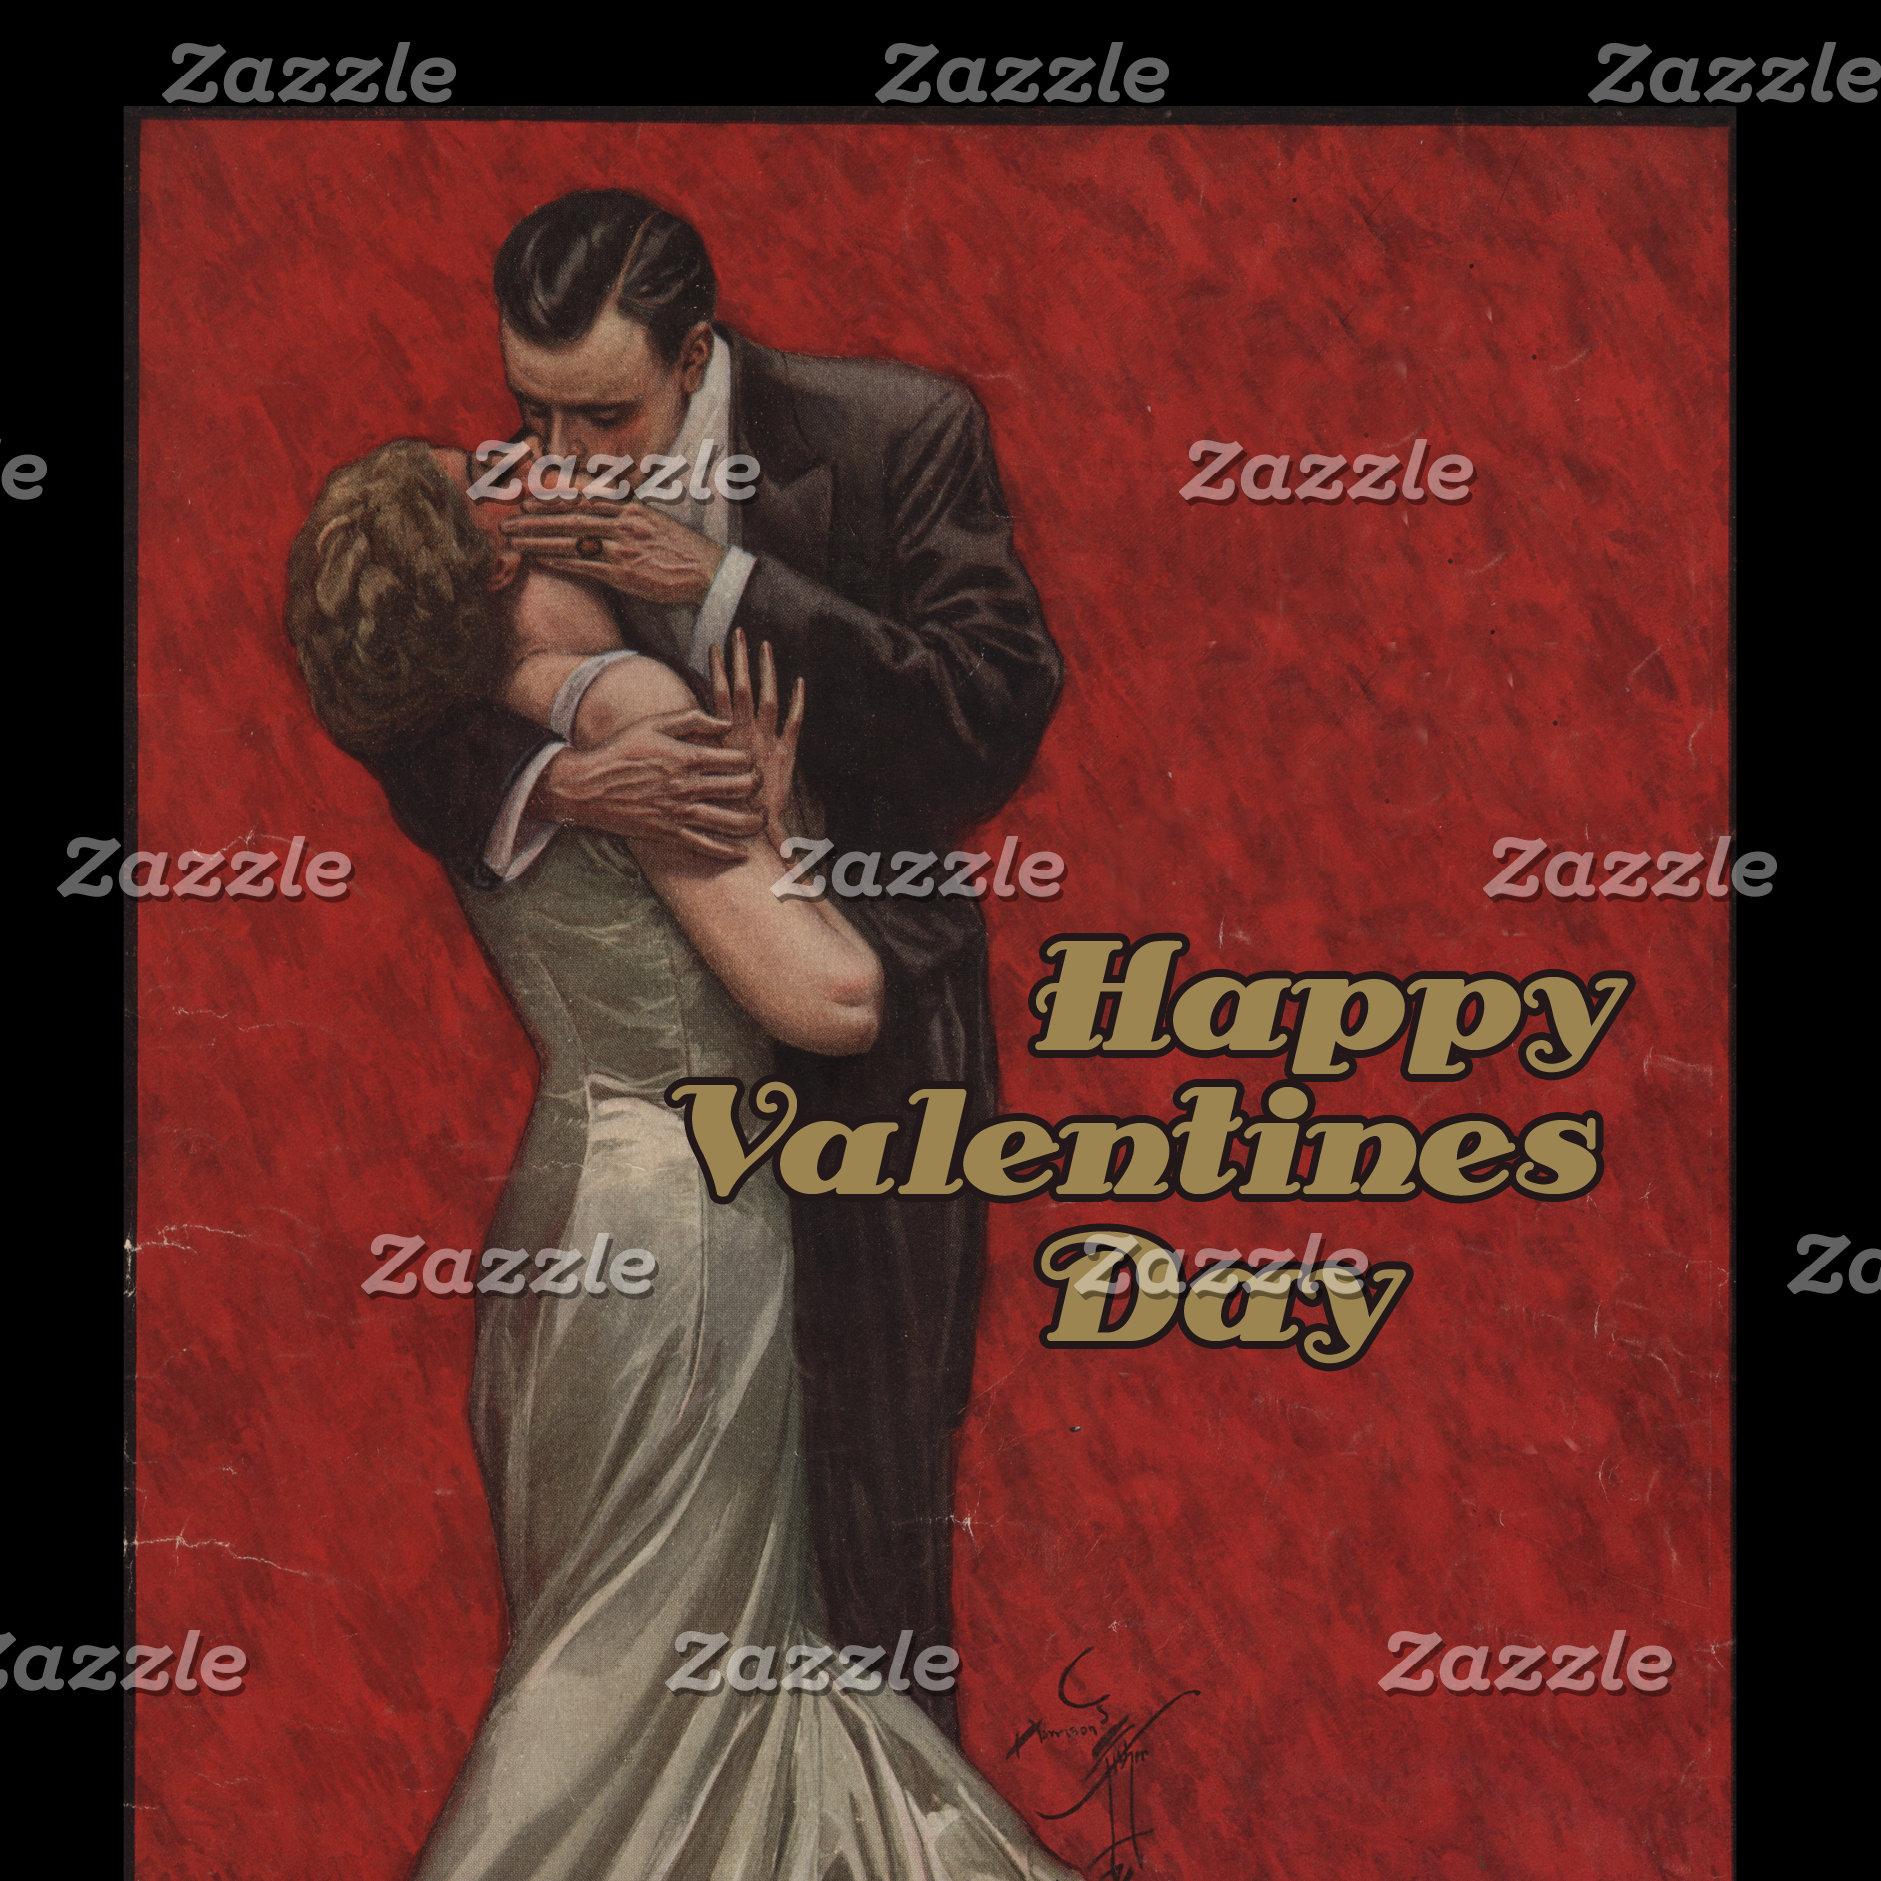 Happy Vintage Valentines Day